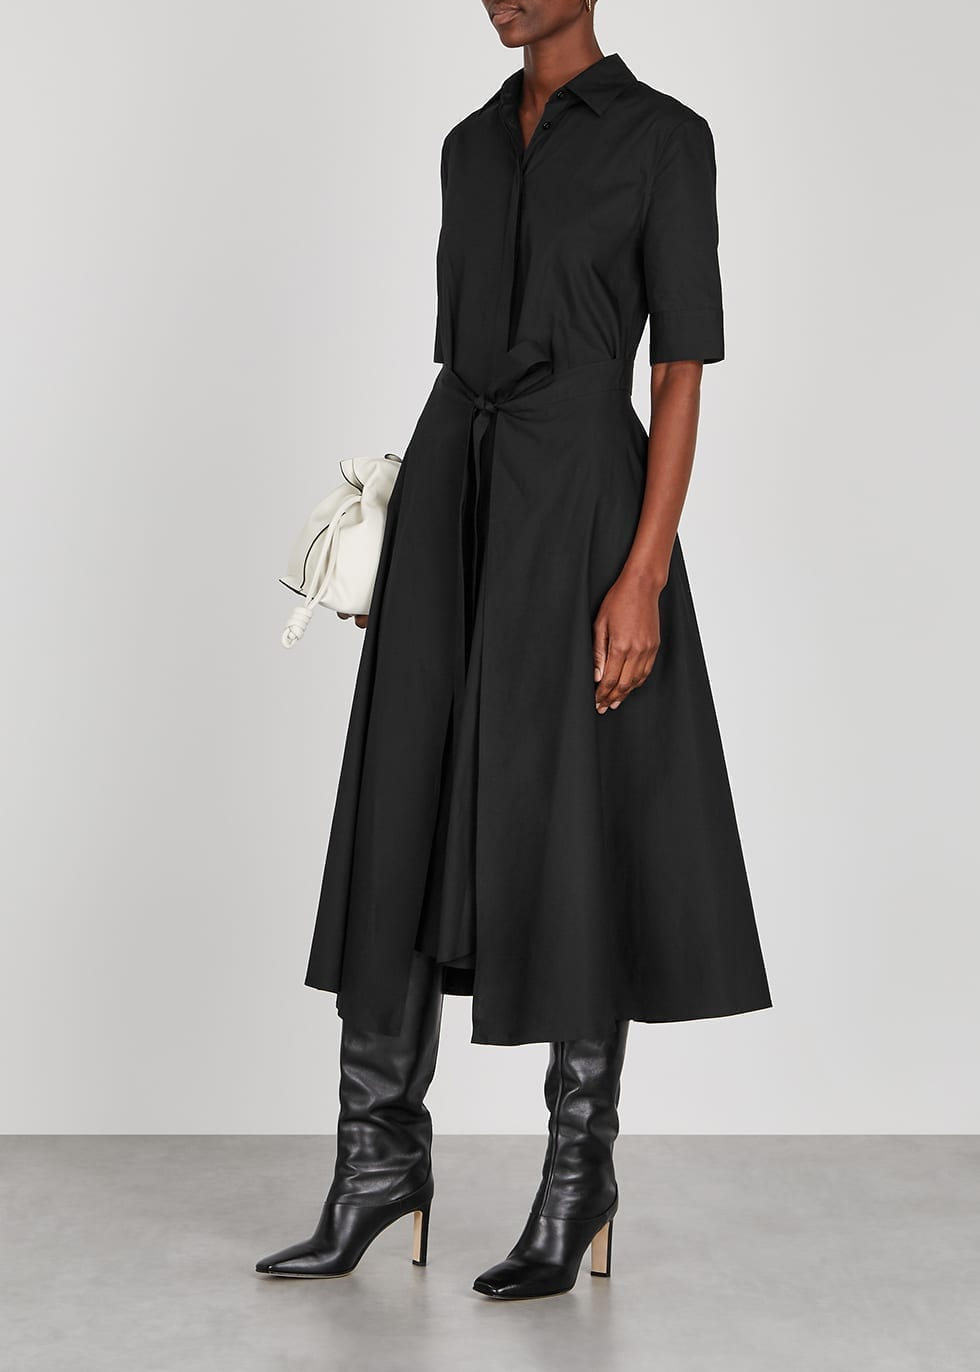 ROSETTA GETTY Black Poplin Shirt Dress